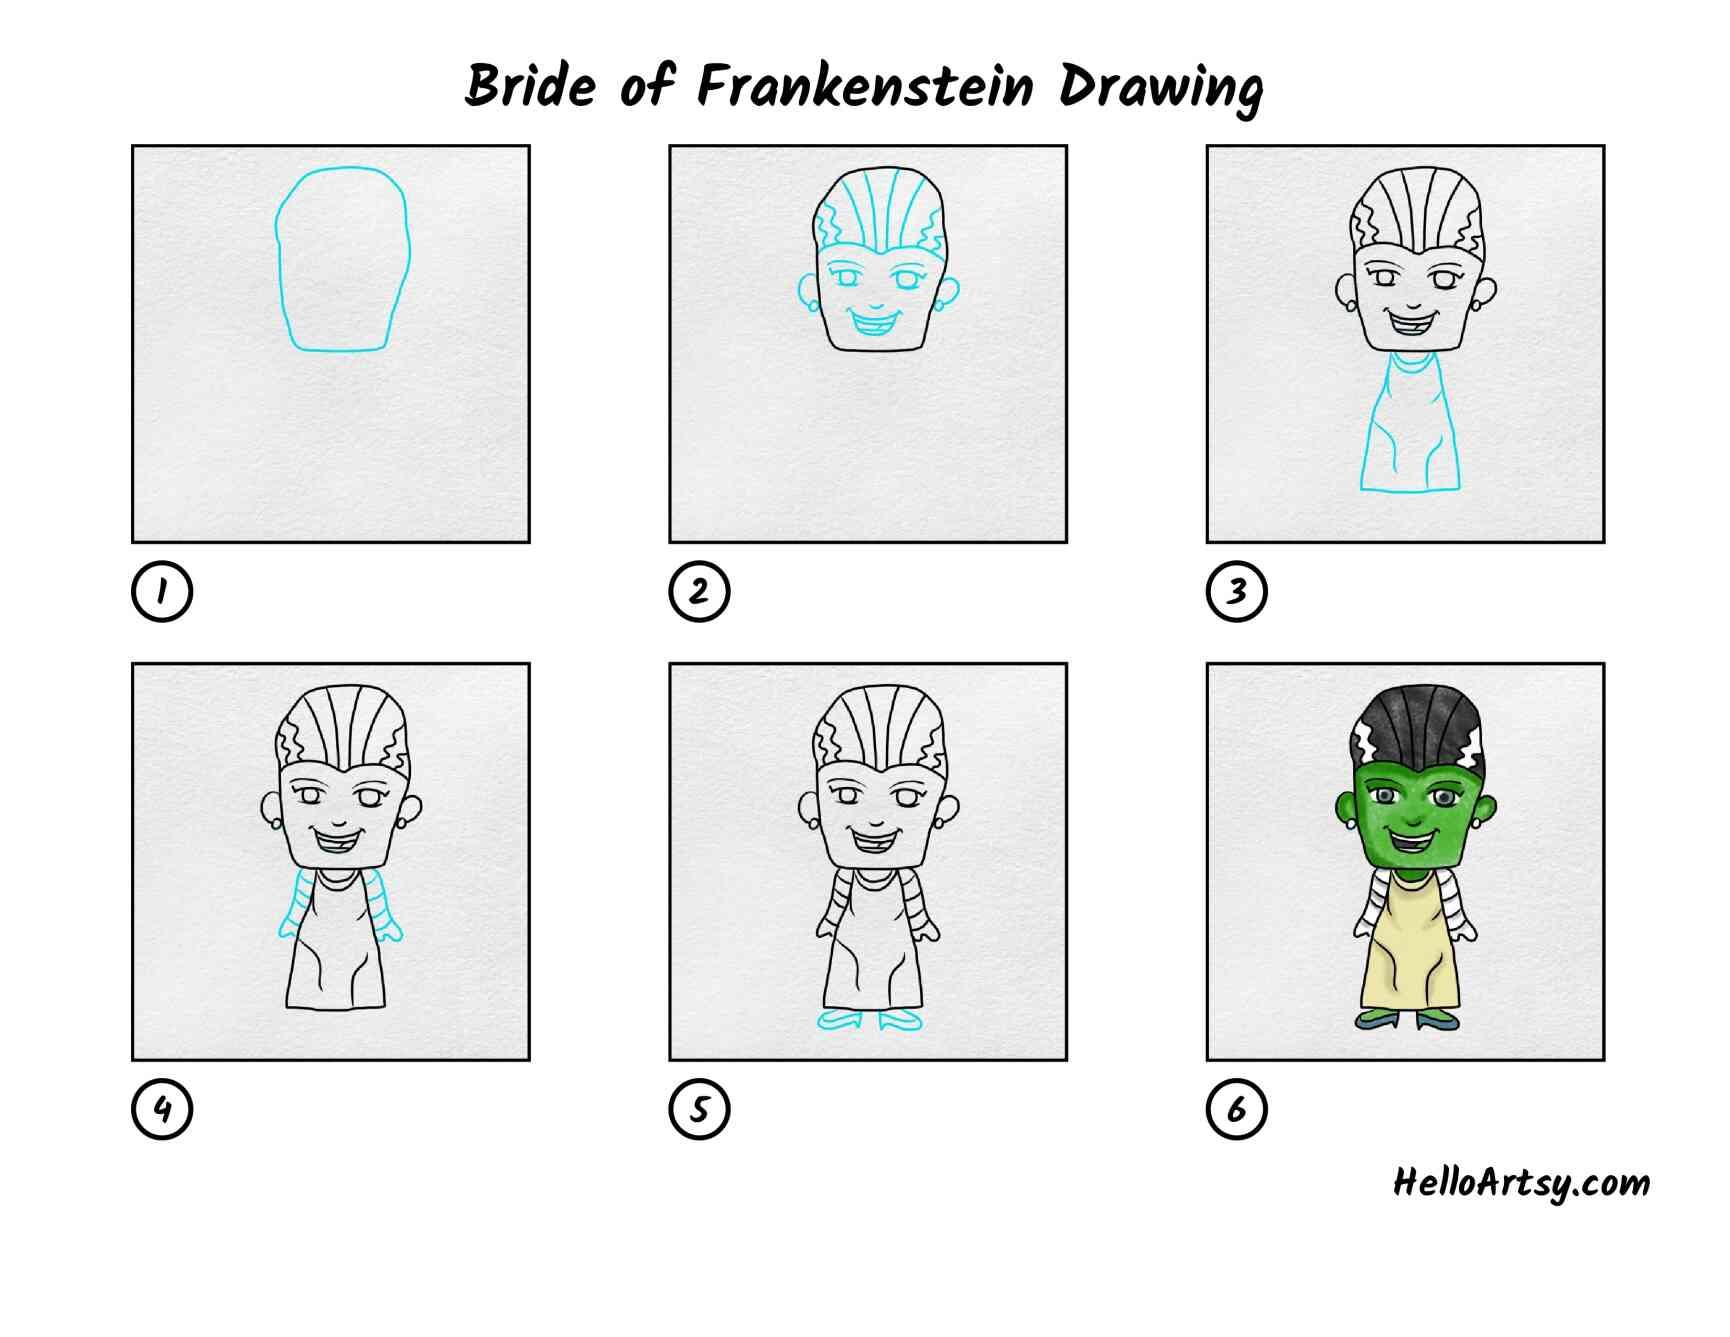 Bride Of Frankenstein Drawing: All Steps